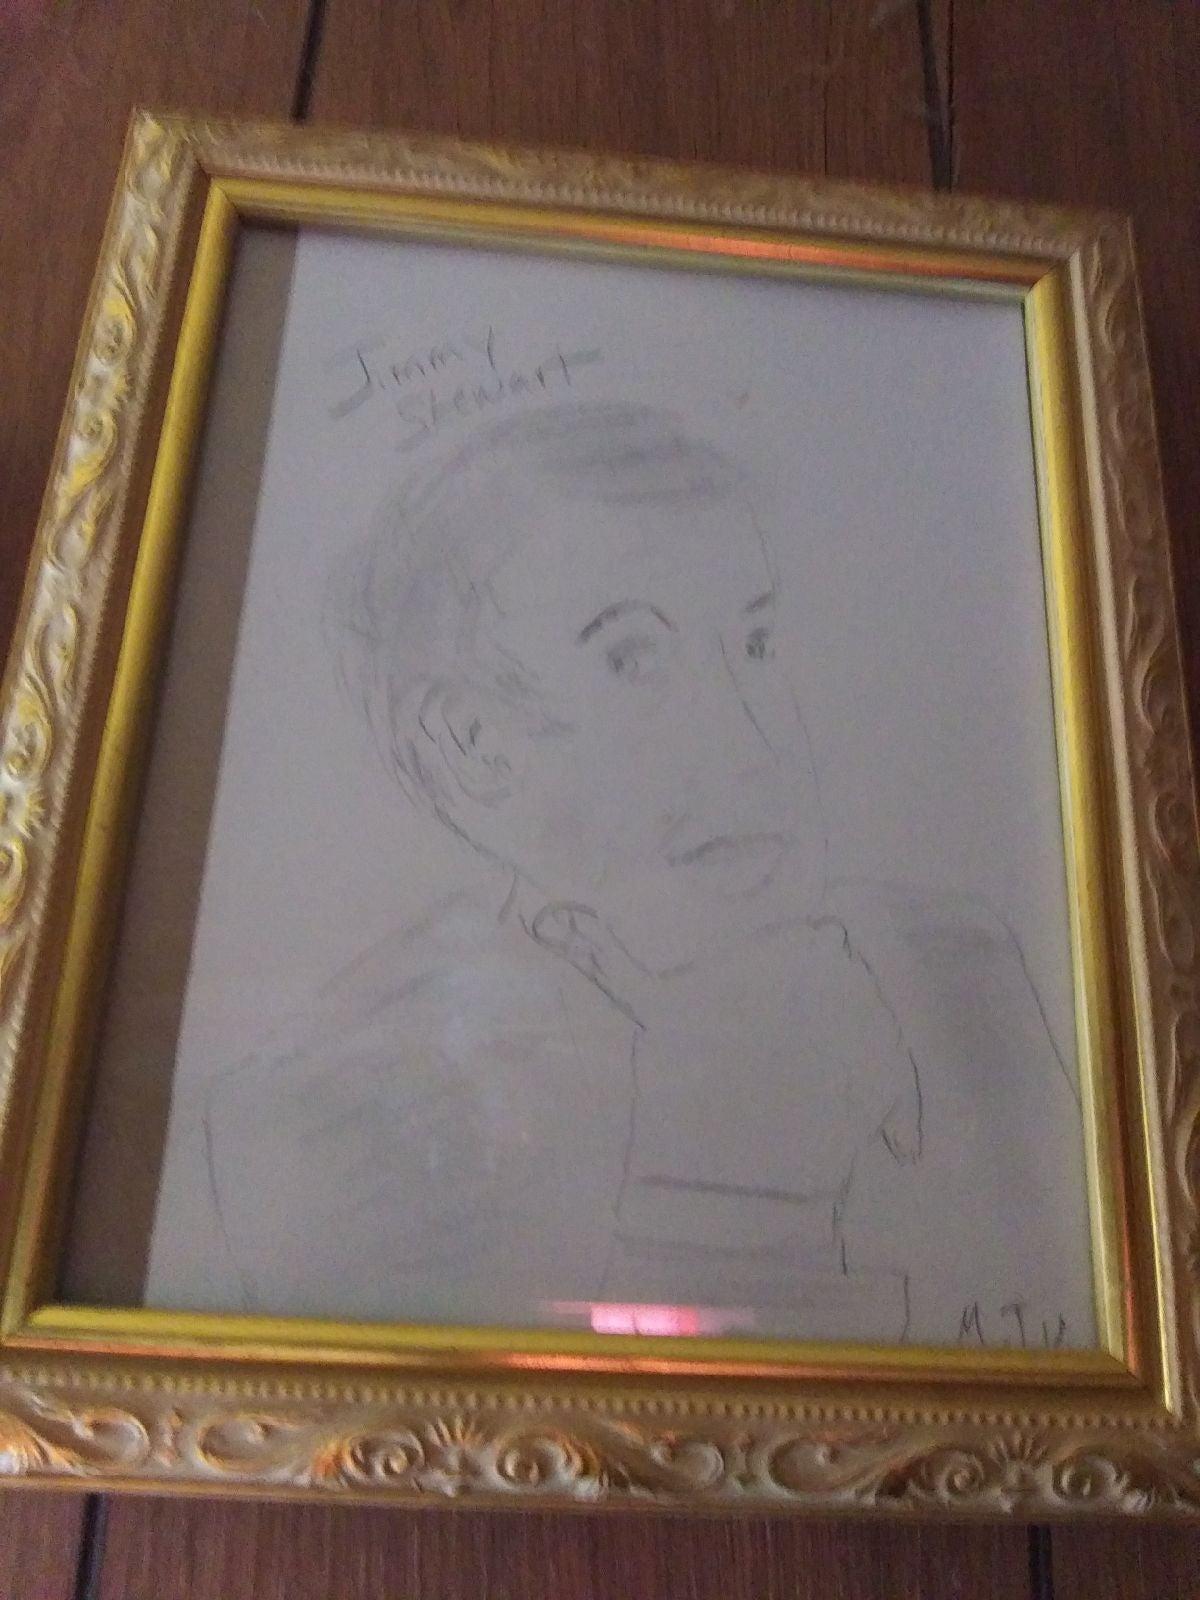 Original drawing of James Stewart